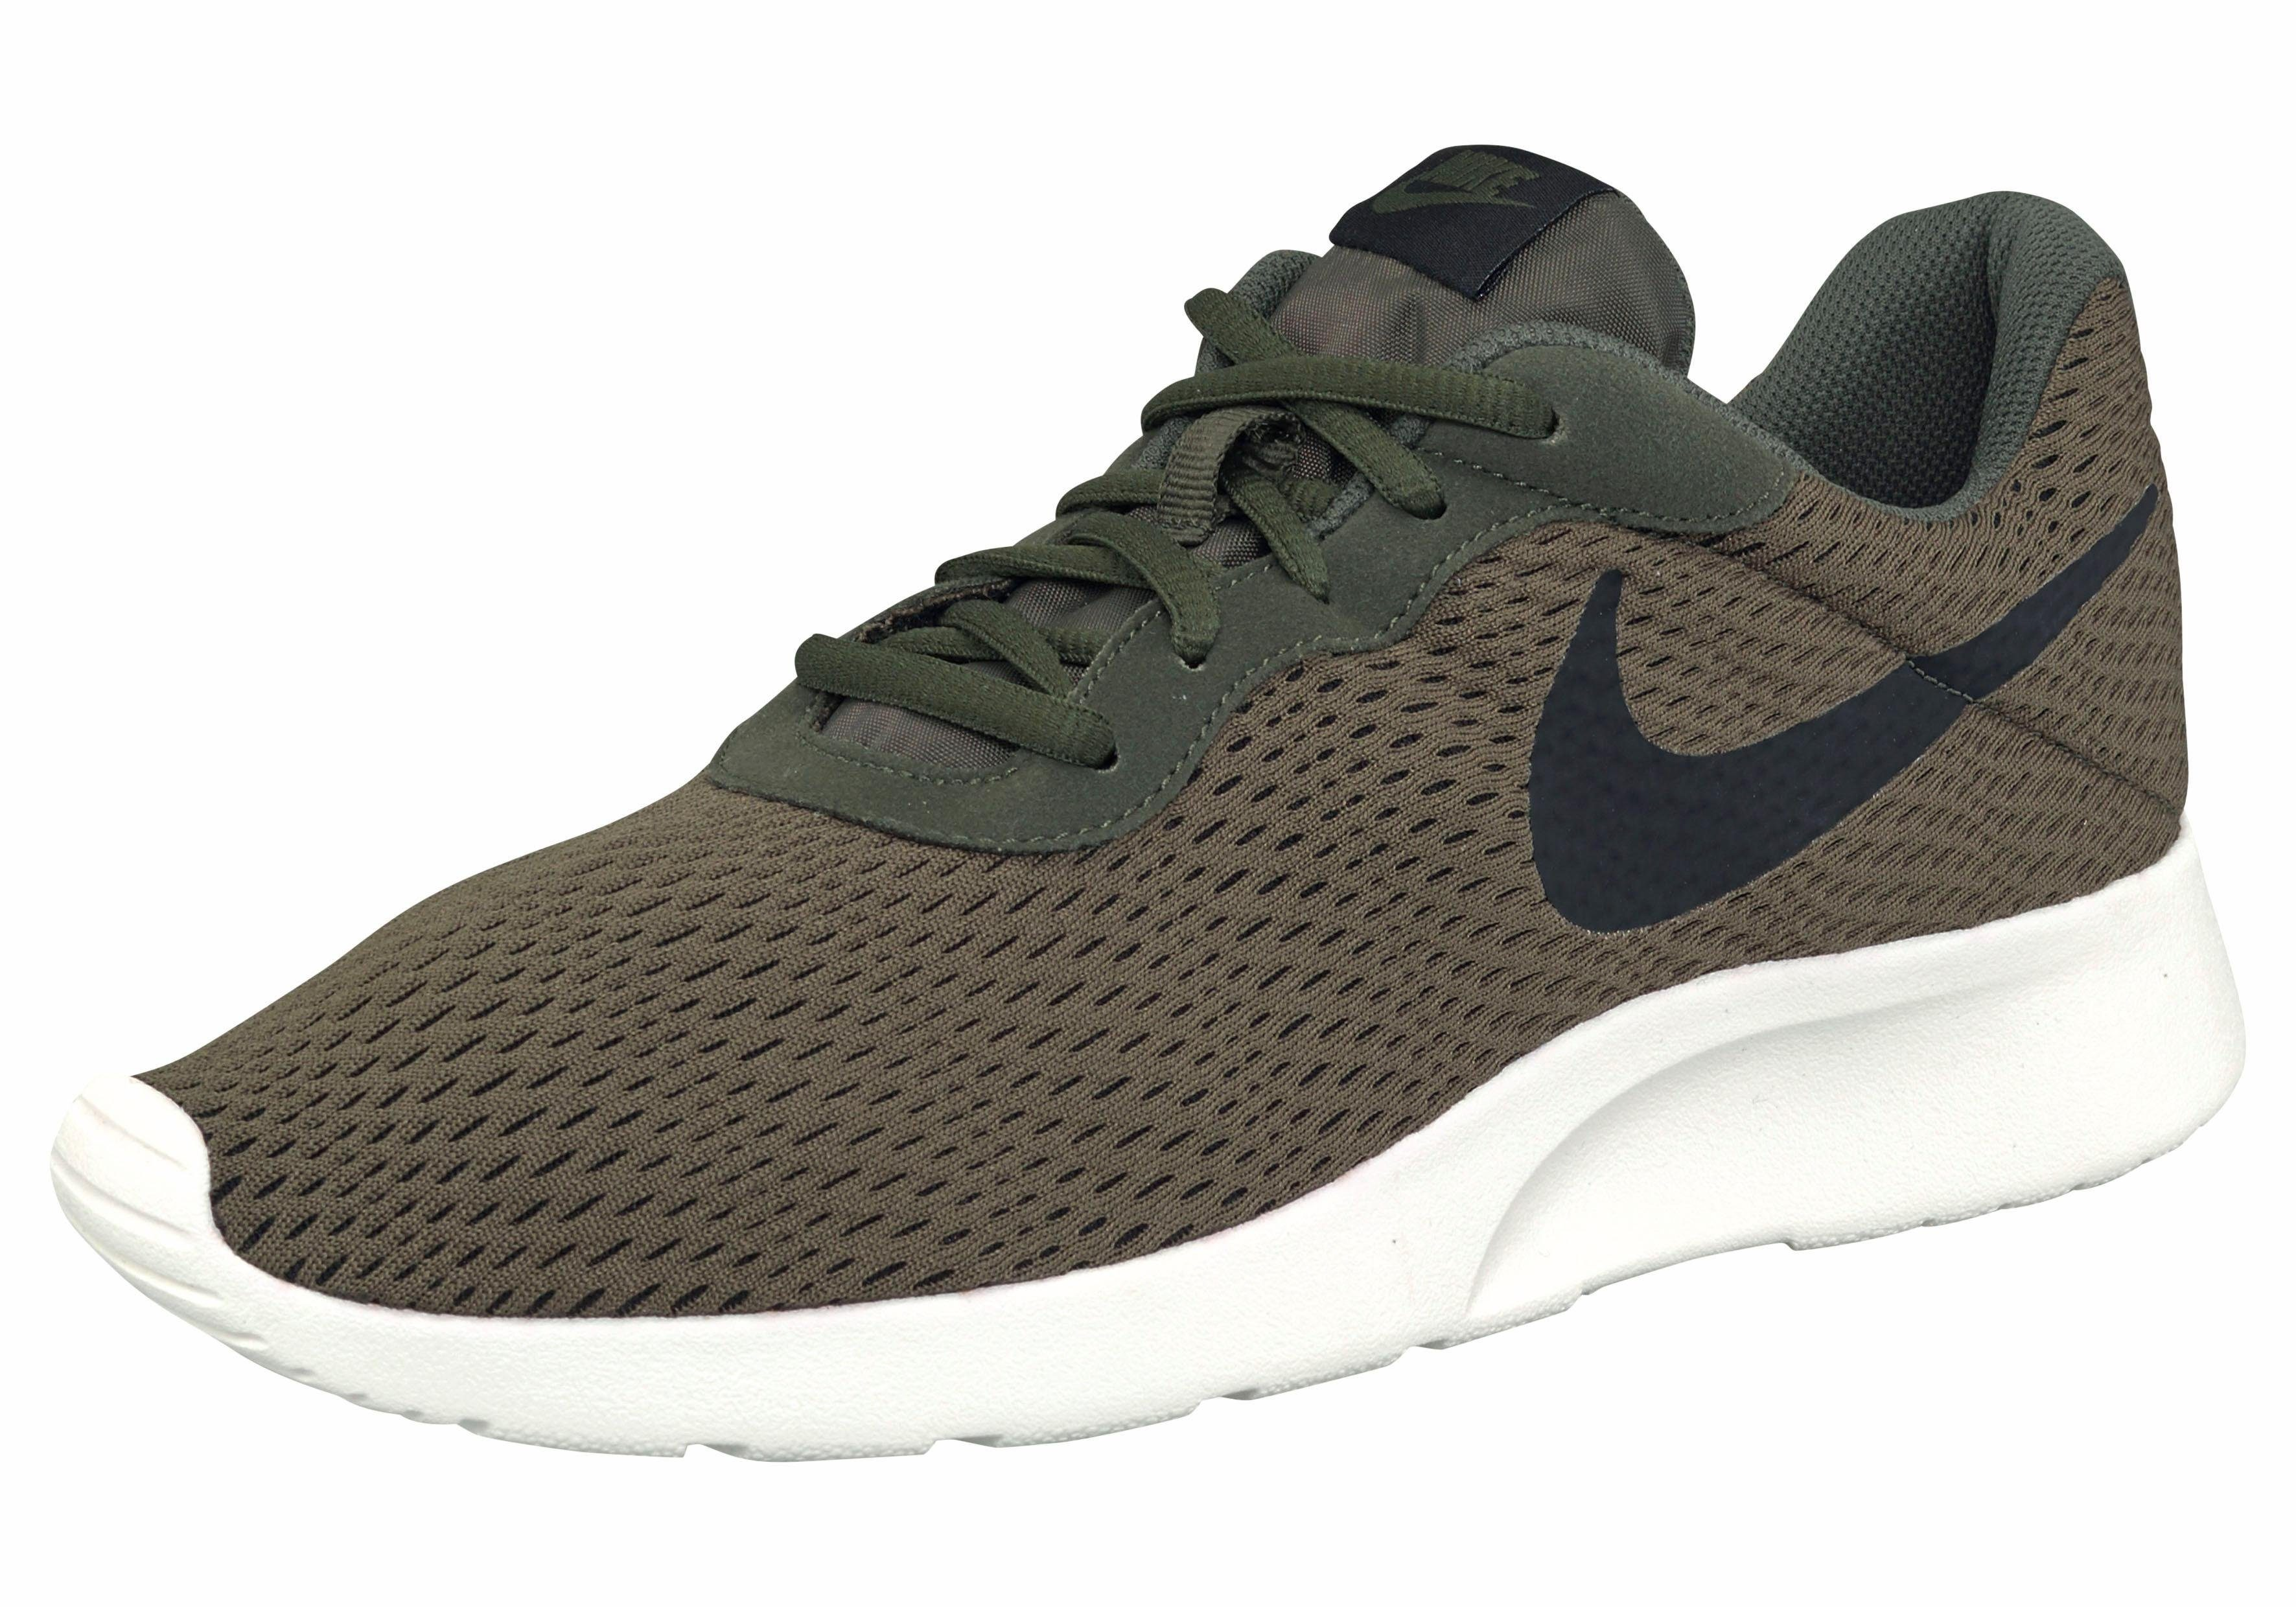 Tanjun Chaussures Vert Nike Pour Les Hommes 3kRGi